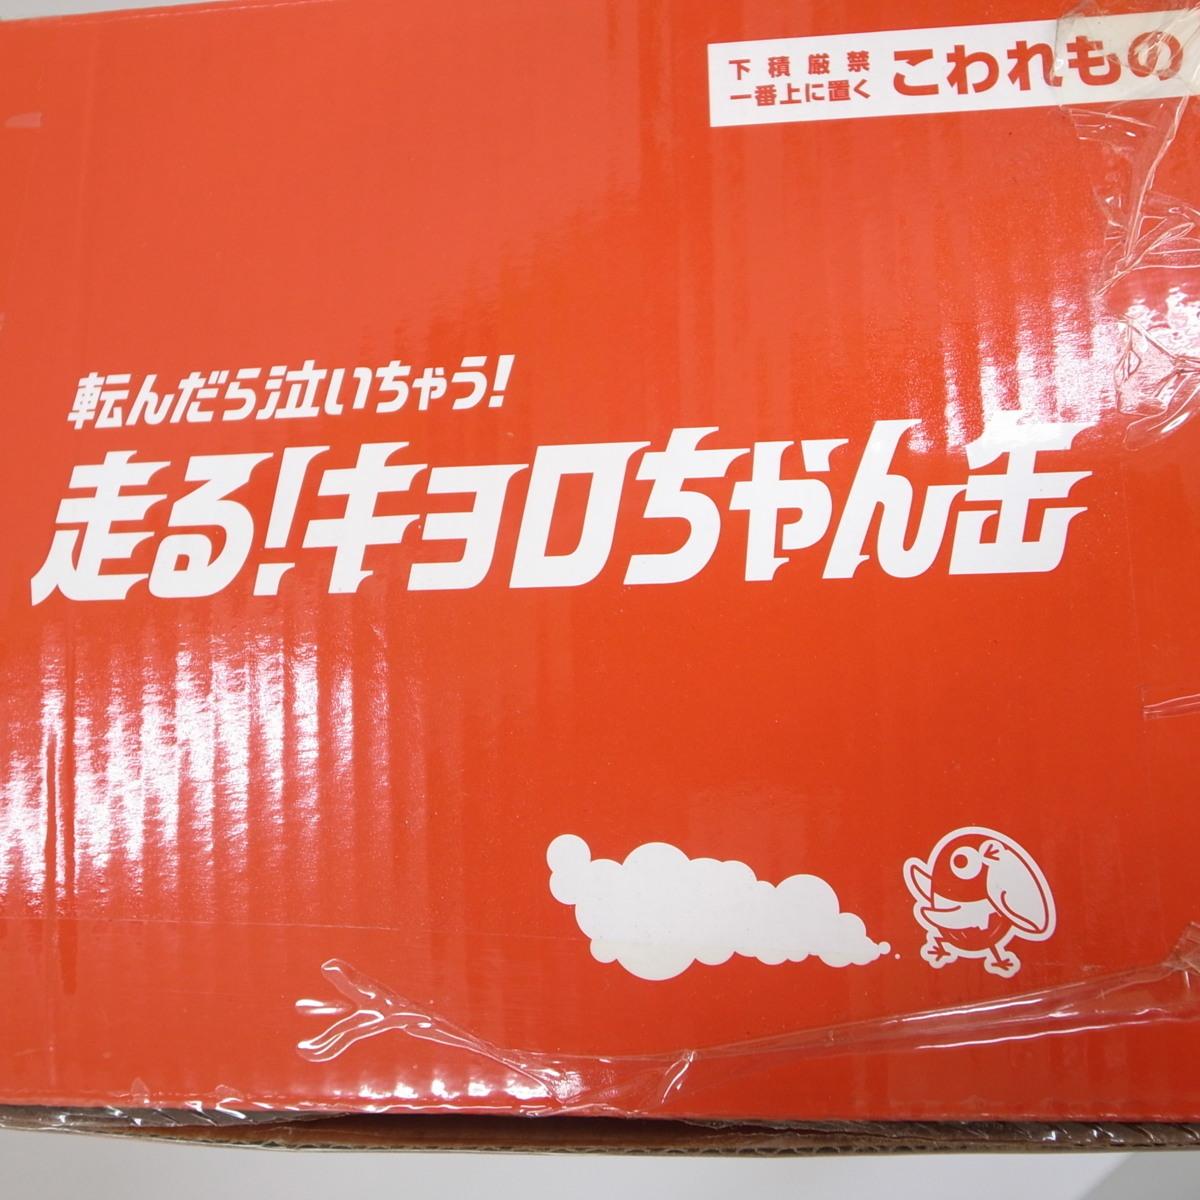 6362T【本物保証】未開封 走る キョロちゃん缶 金のエンゼル 銀のエンゼル おもちゃのカンヅメ 森永チョコボール_画像5